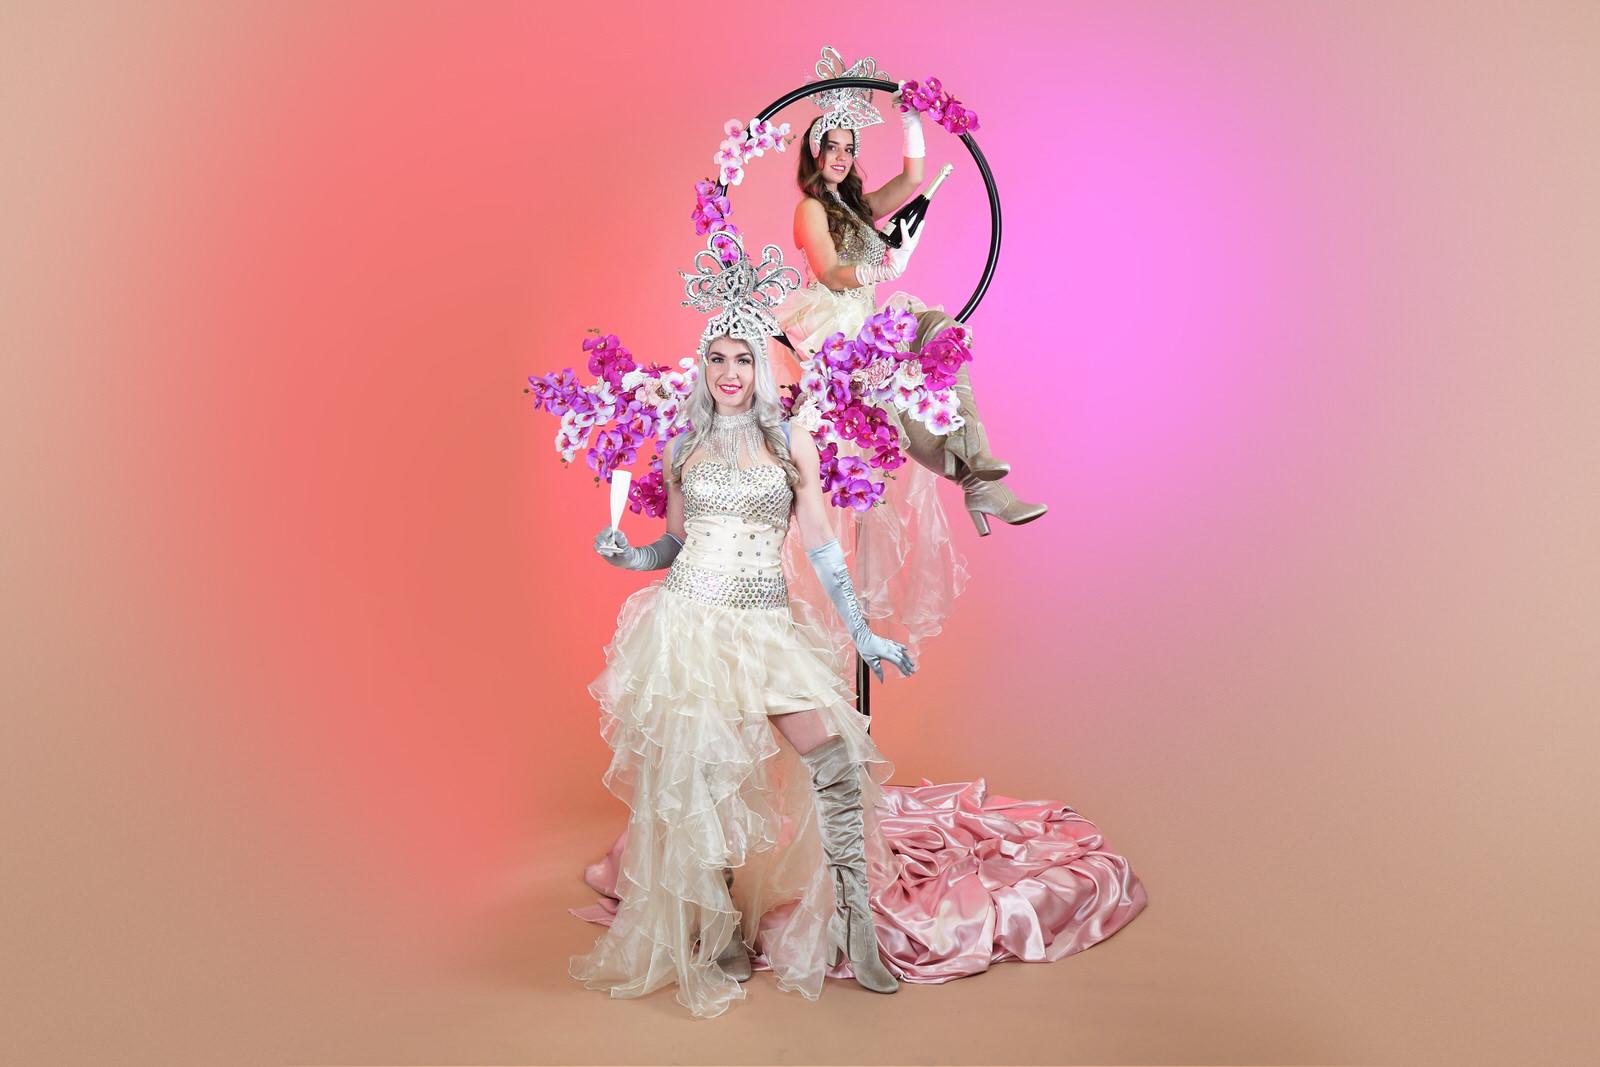 Champagne dames, aerial champagne, welkomst act, gastenontvangst, event entertainment, wedding, bruiloft